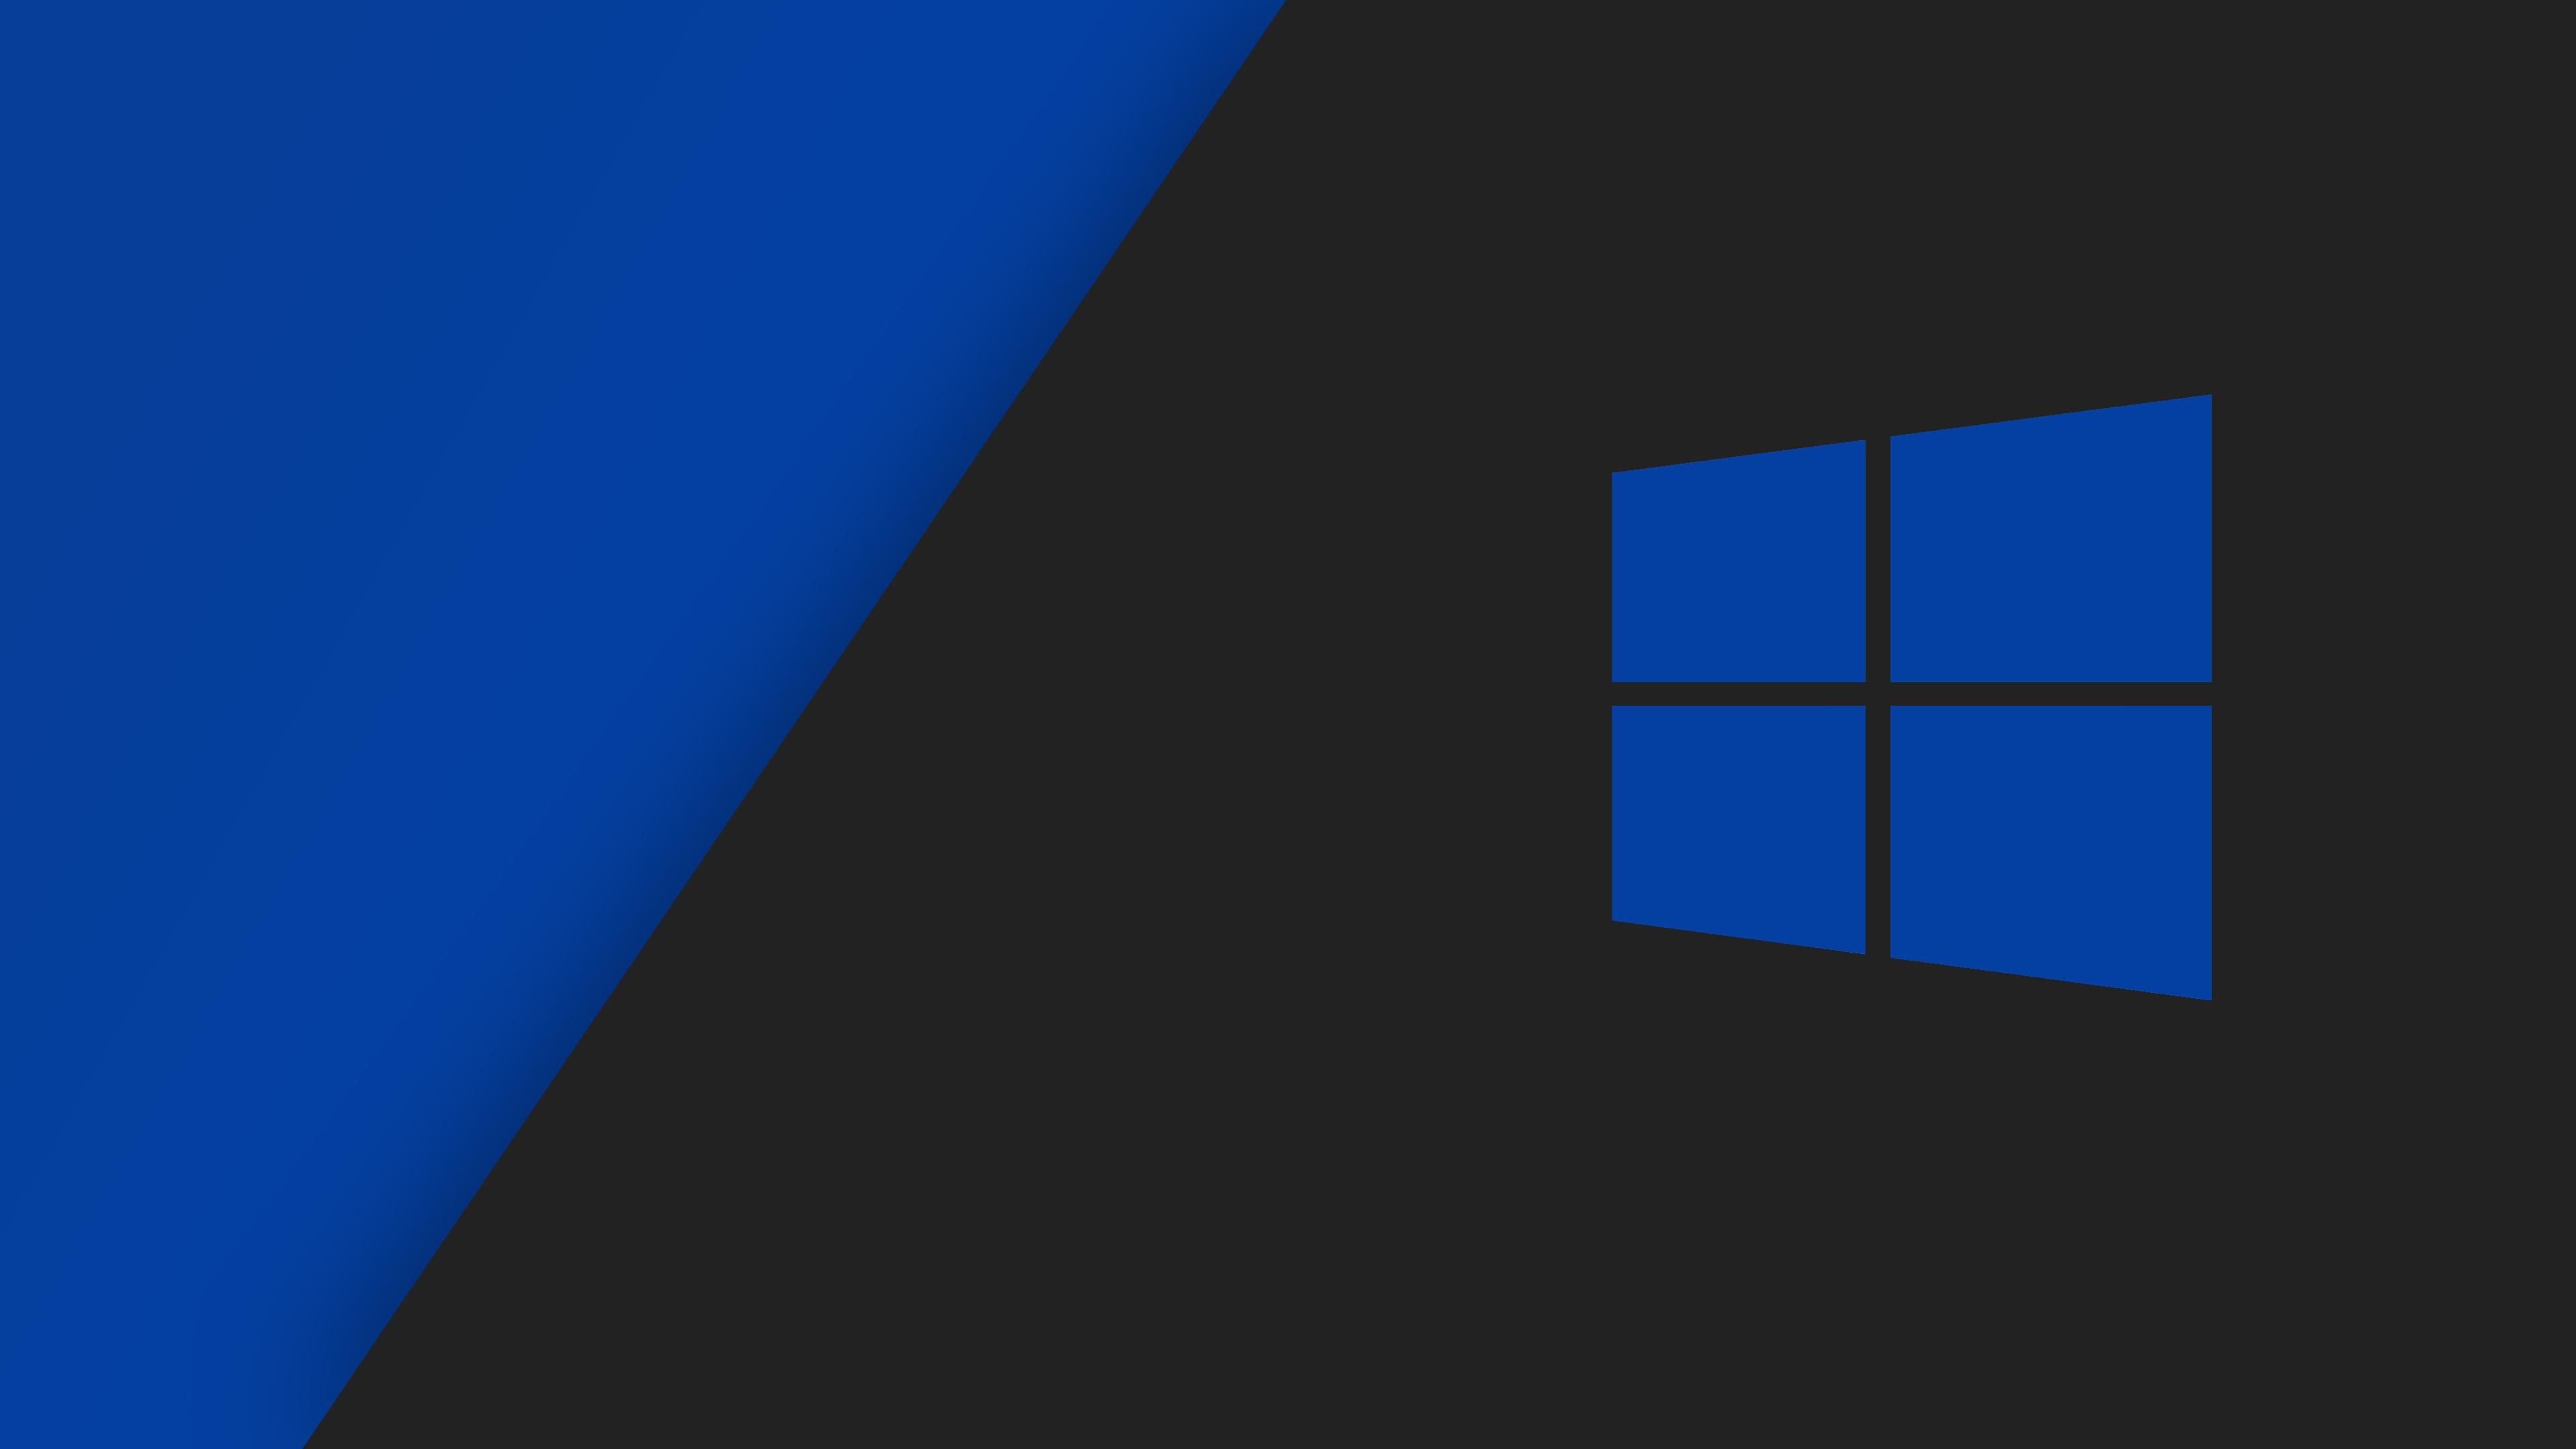 Free Download Windows 10 Wallpaper By Spectalfrag Watch